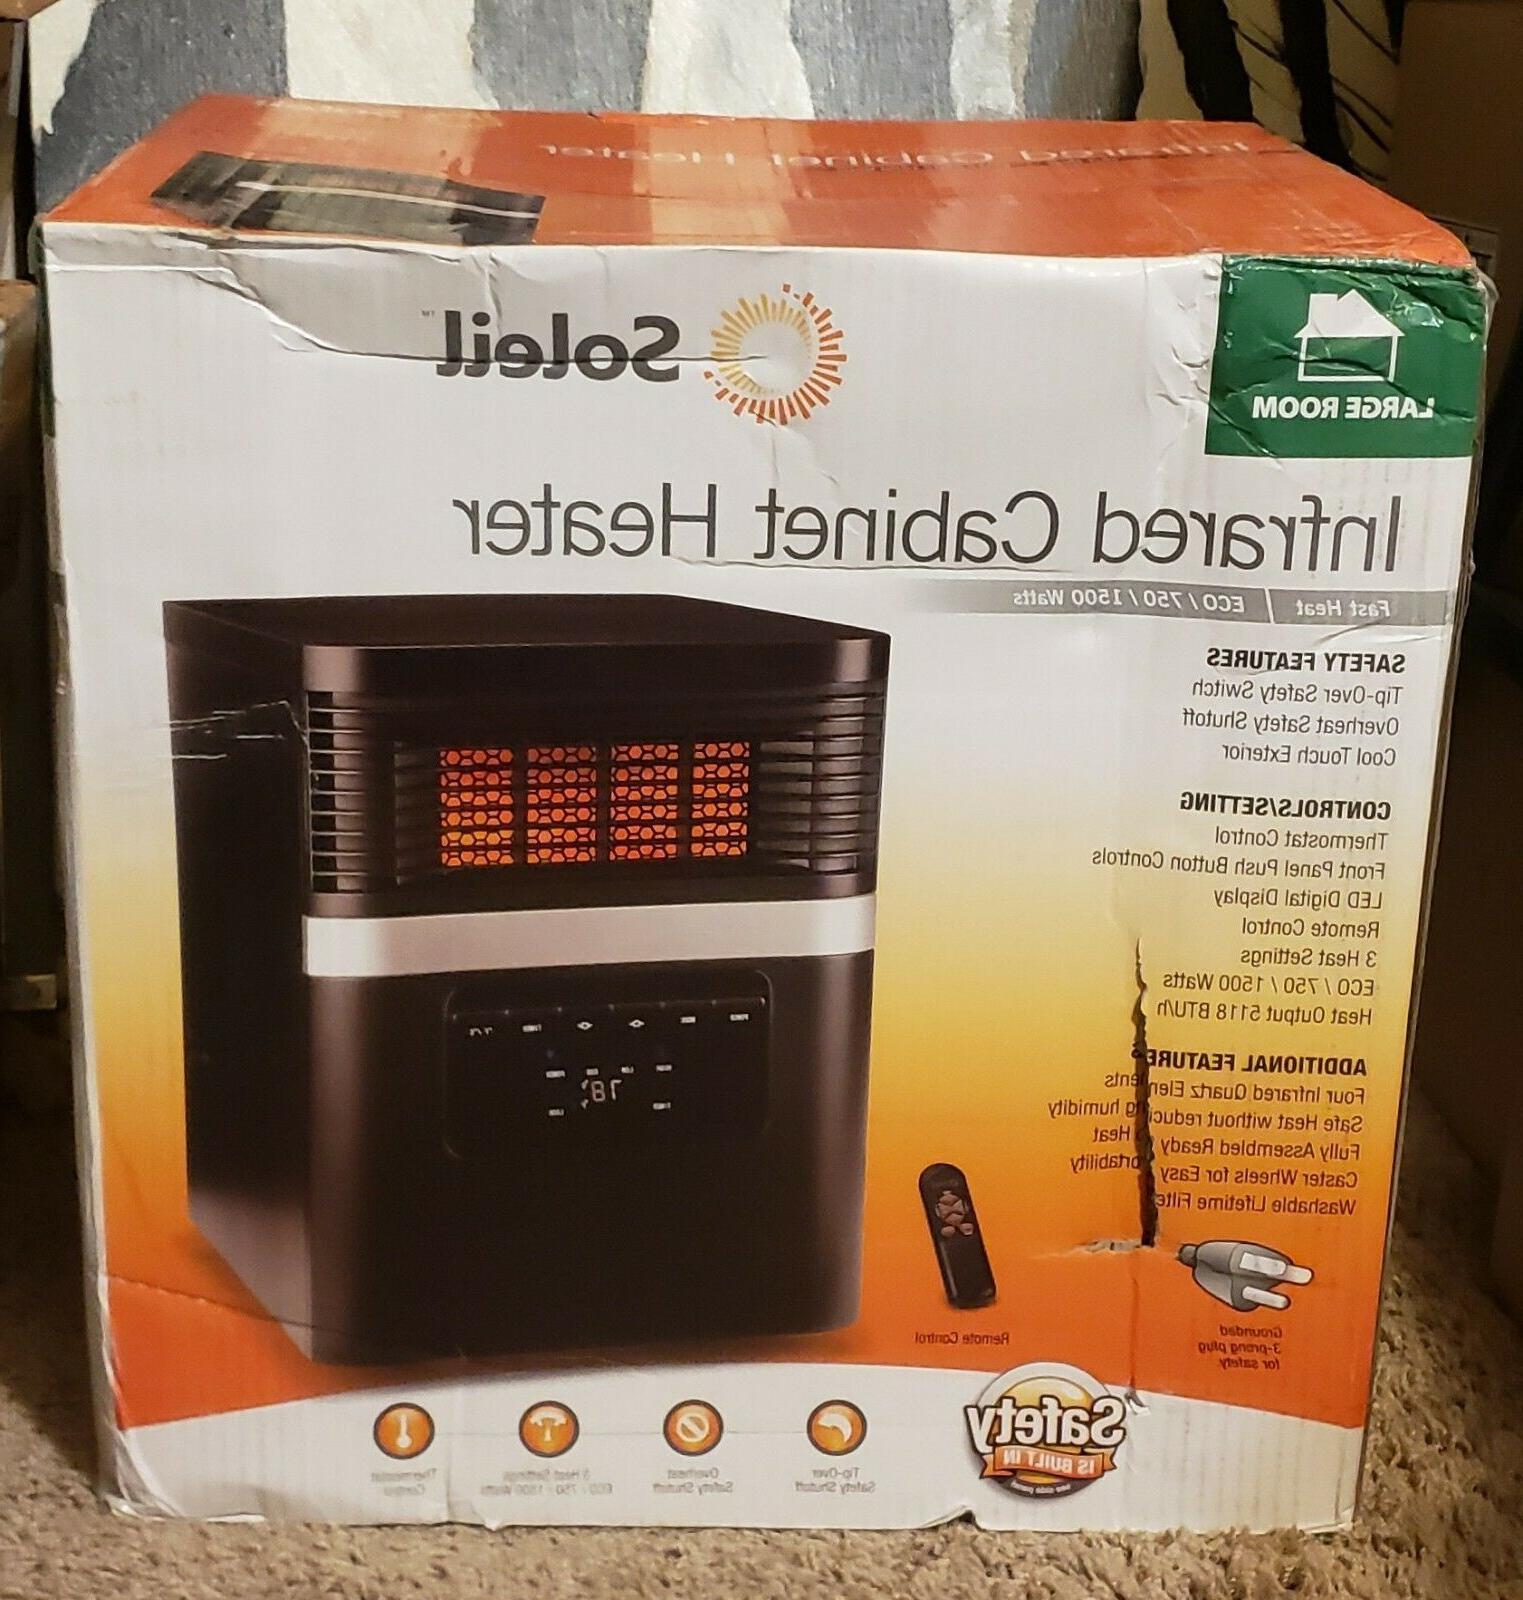 Soleil Infrared Cabinet Heater ECO/750/1500 Watts